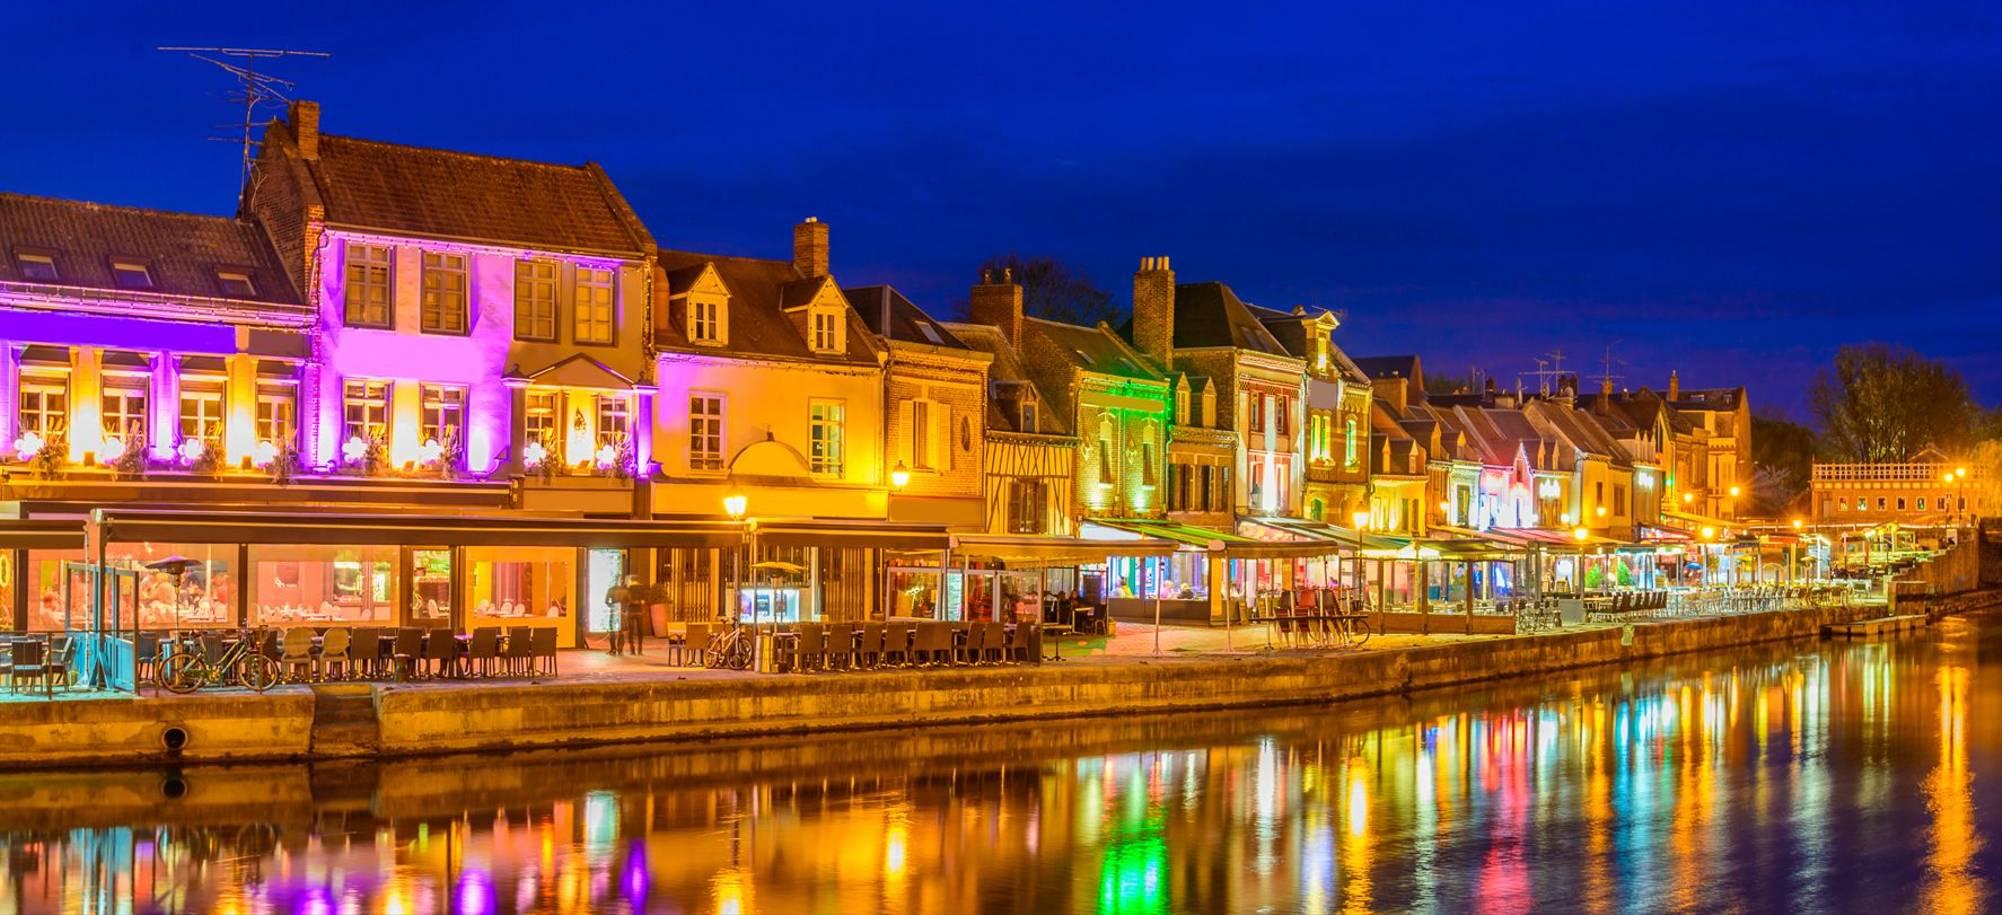 Amiens.jpg